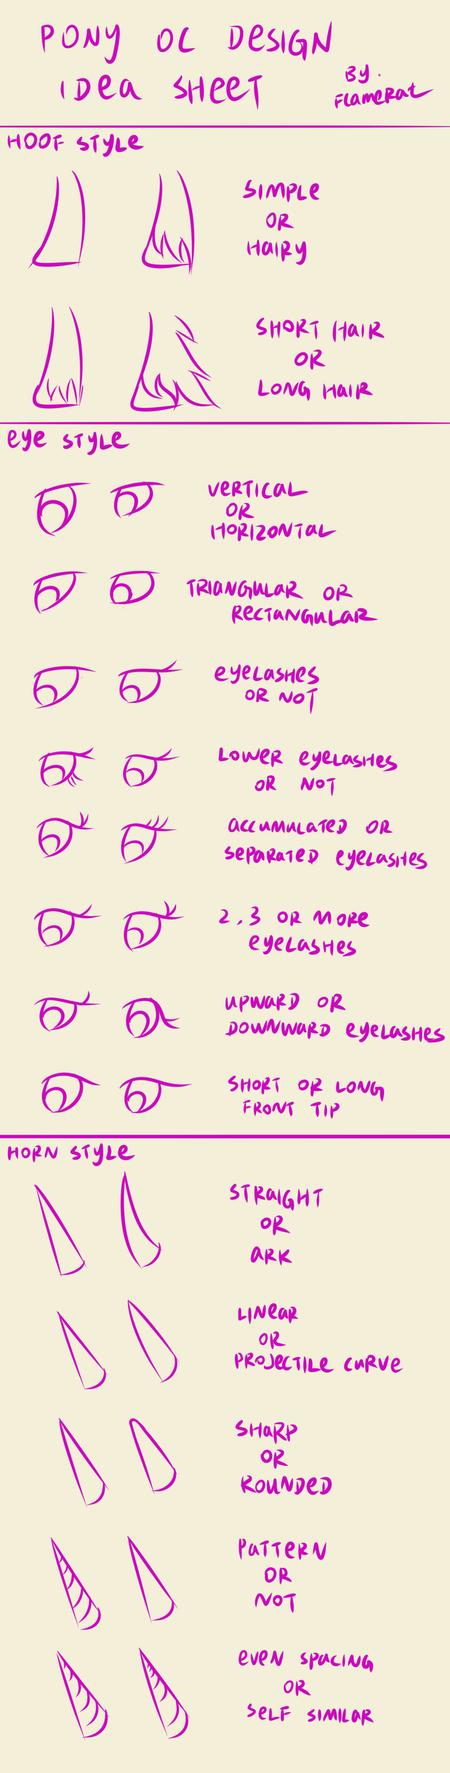 Pony OC design idea sheet: hoof, eye and horn by FlameRat-YehLon